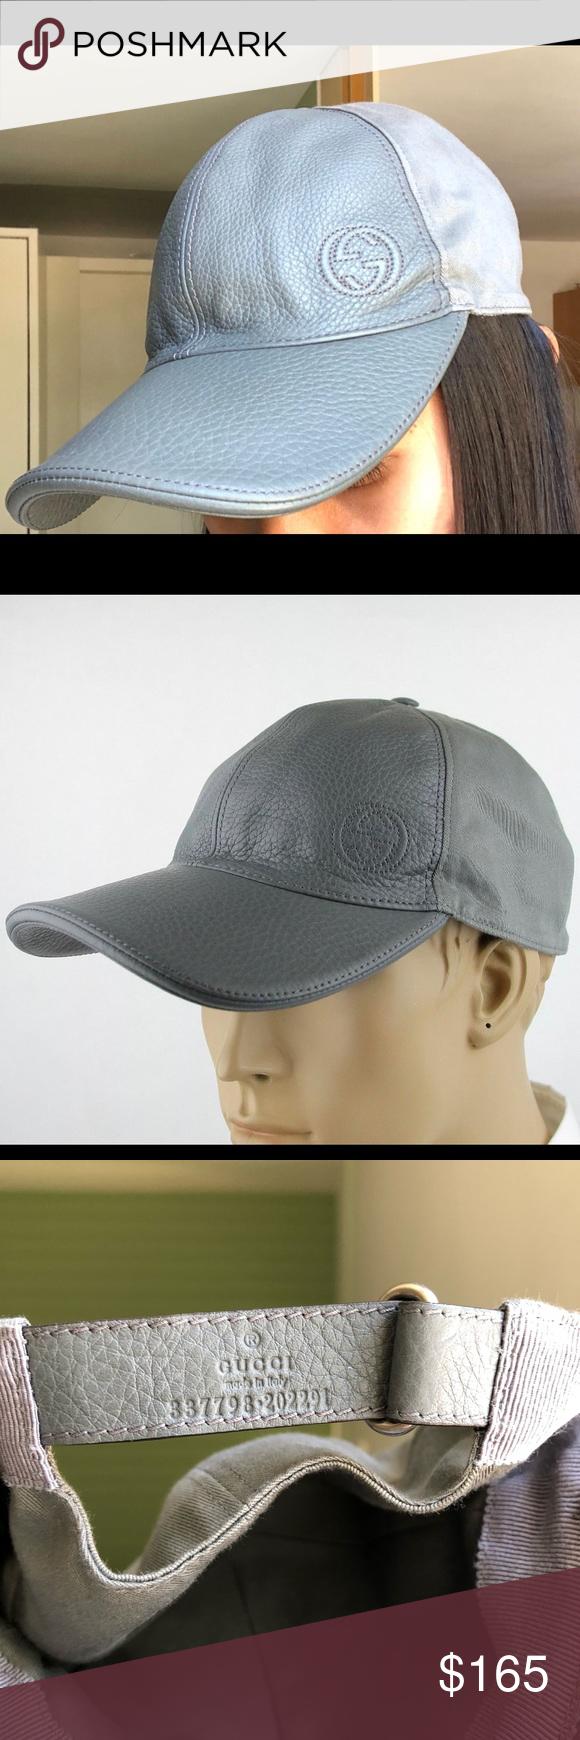 100 authentic gucci visor hat cap size cheap 21ab4 97acf - jundinews.com 95848e52625b